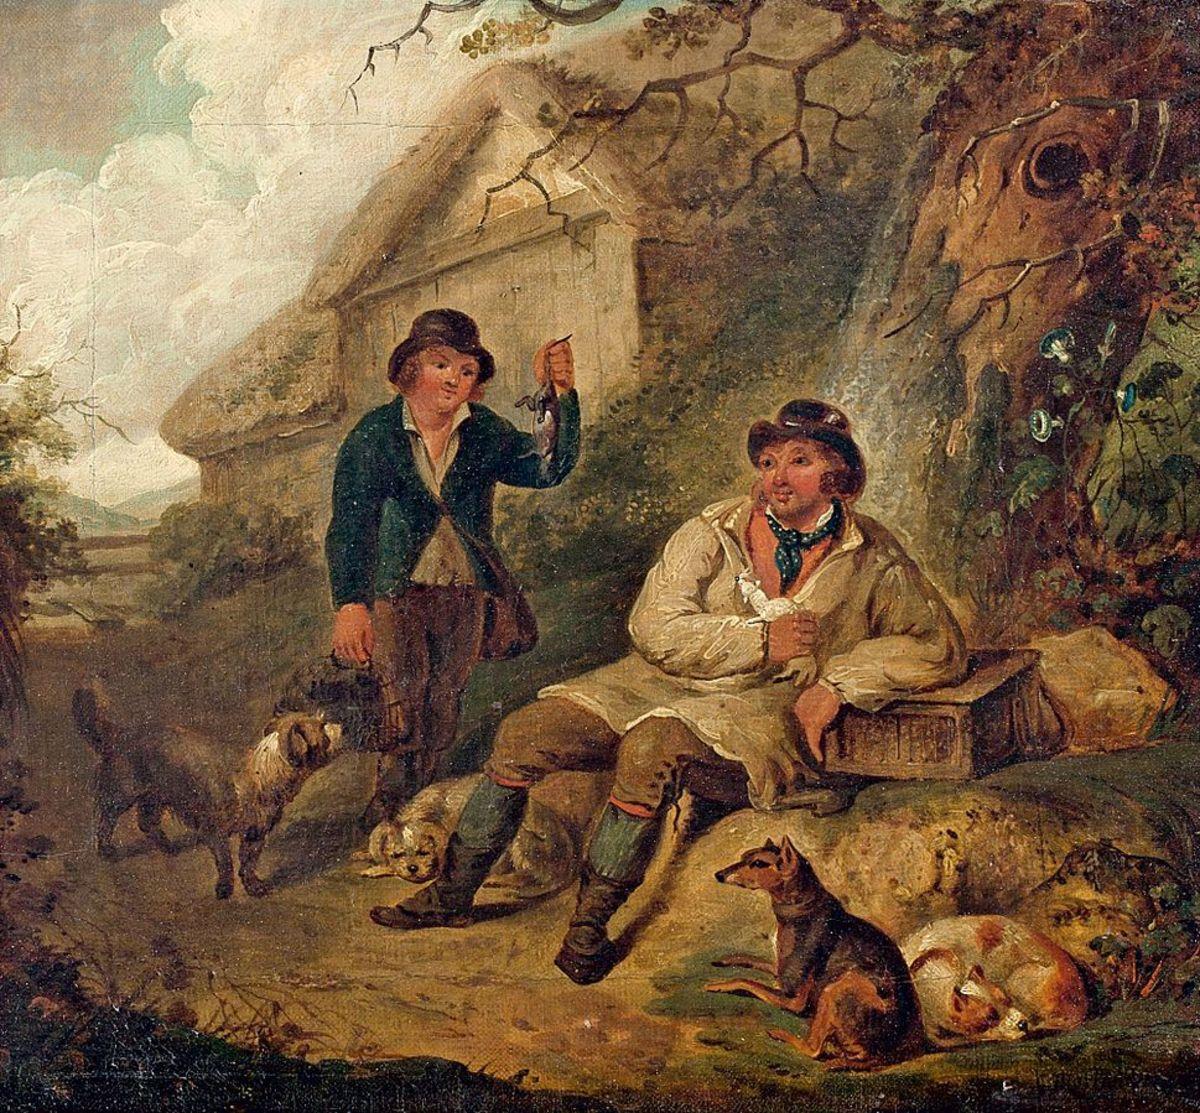 Rural life according to George Morland 1793.